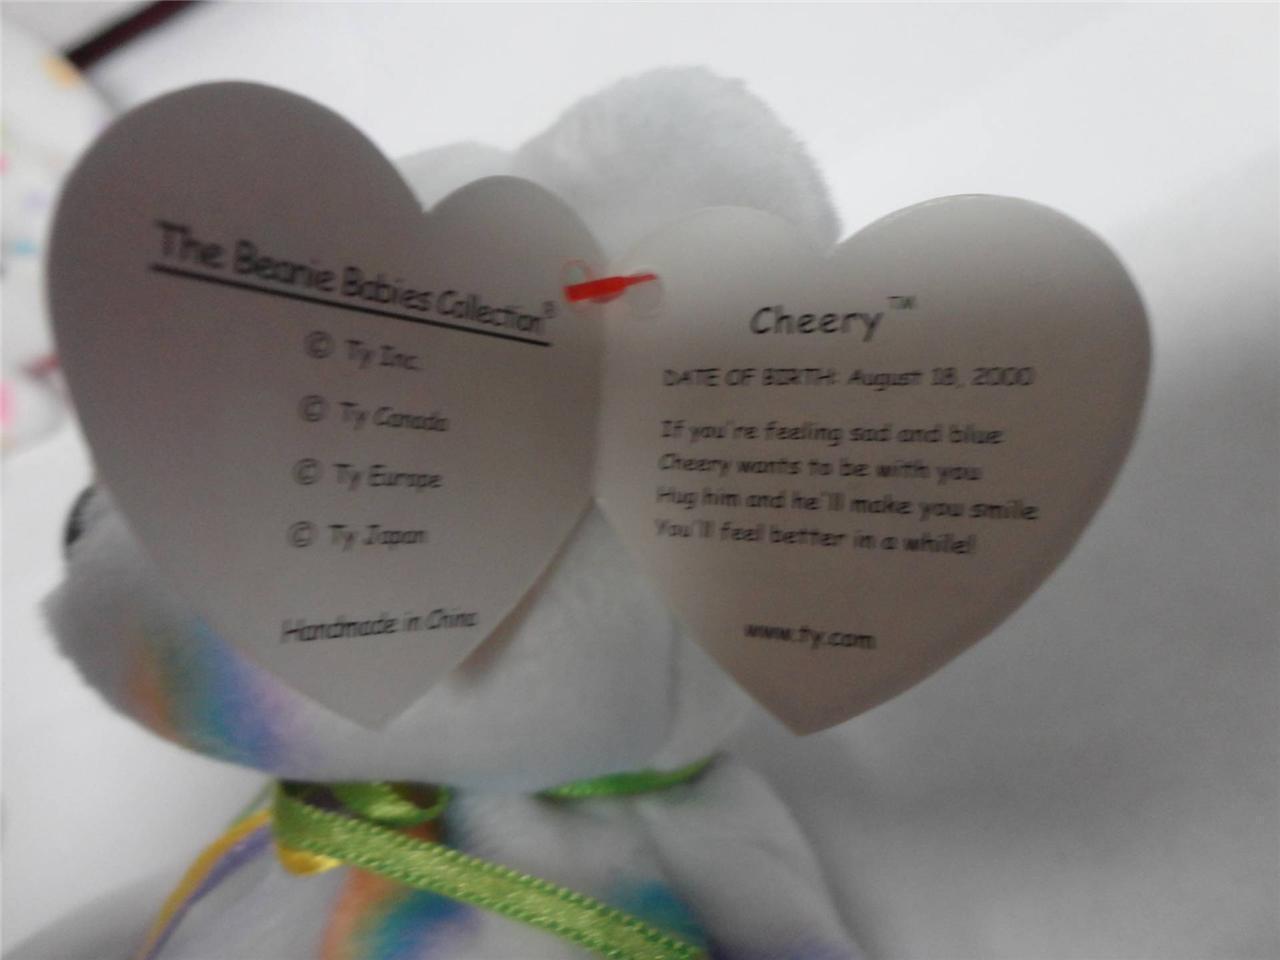 TY Beanie Baby Bears Glory 1997 Cheery 2000 and Kissme 2001 Lot of 3